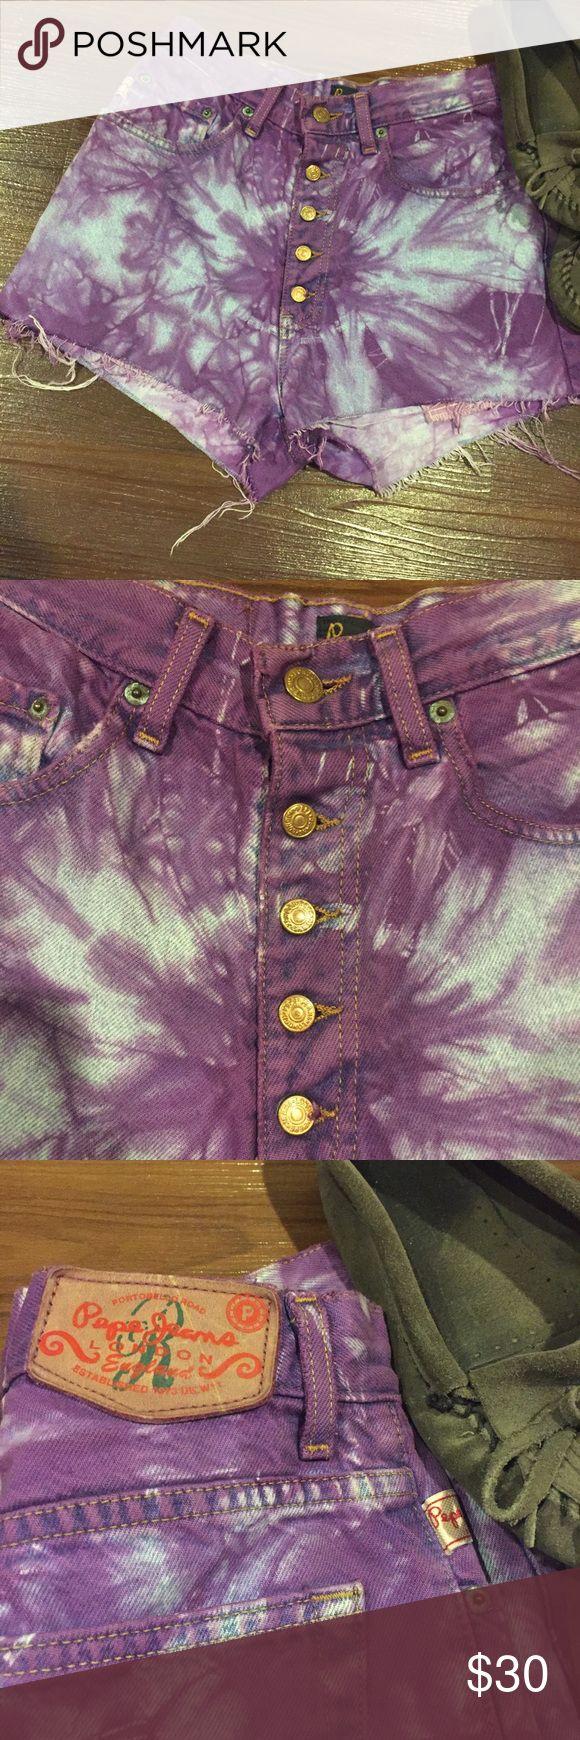 Pepe Jeans Festival High Waisted Acid Wash Shorts Pepe Jeans London High Waisted Purple Acid Wash Shorts • Moccasins not included. Pepe Jeans Shorts Jean Shorts